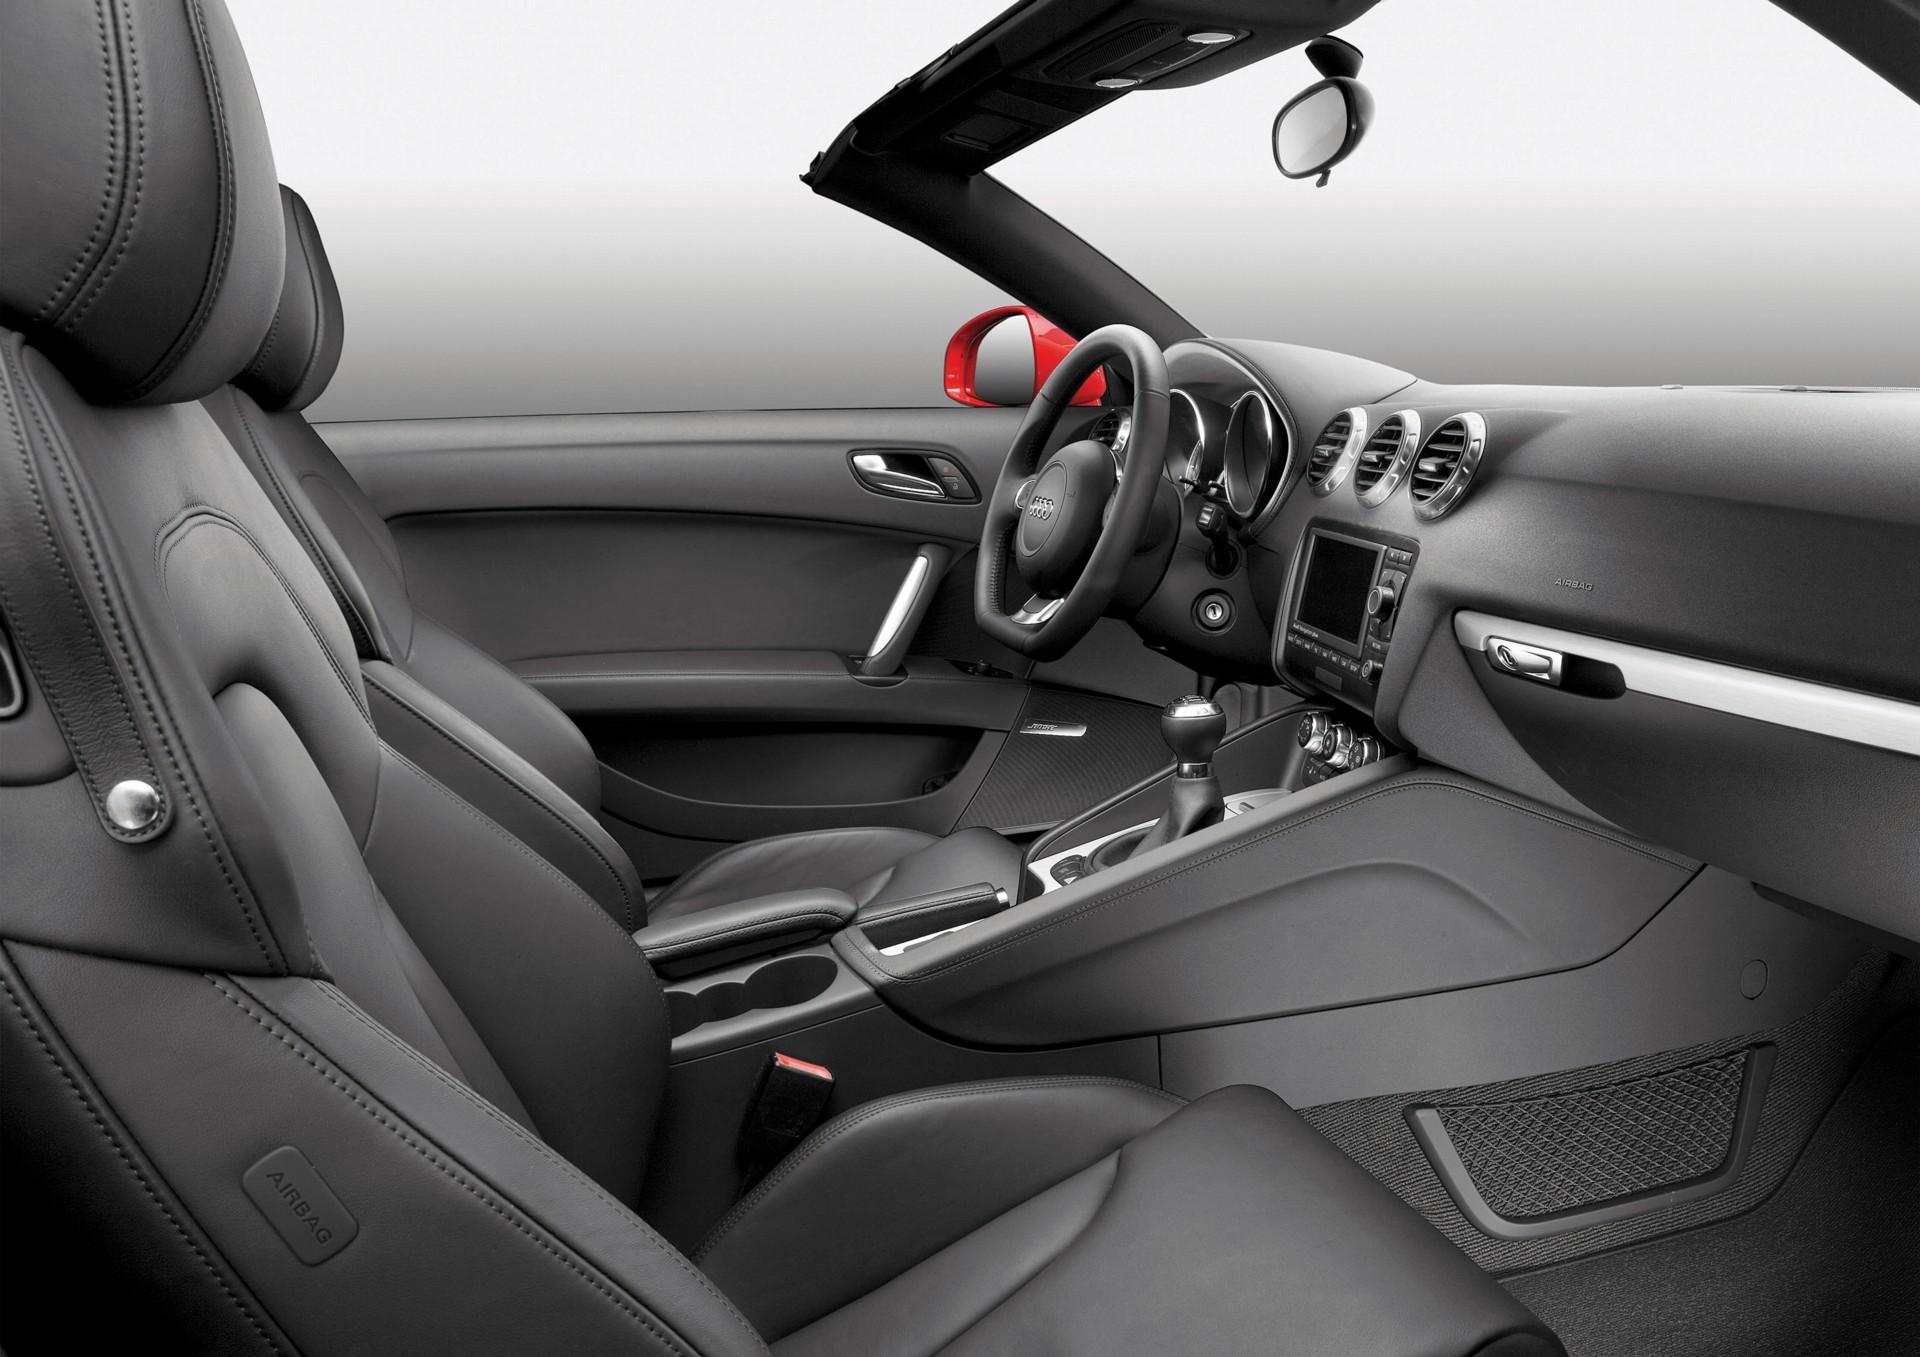 2007 Audi TT Roadster Image